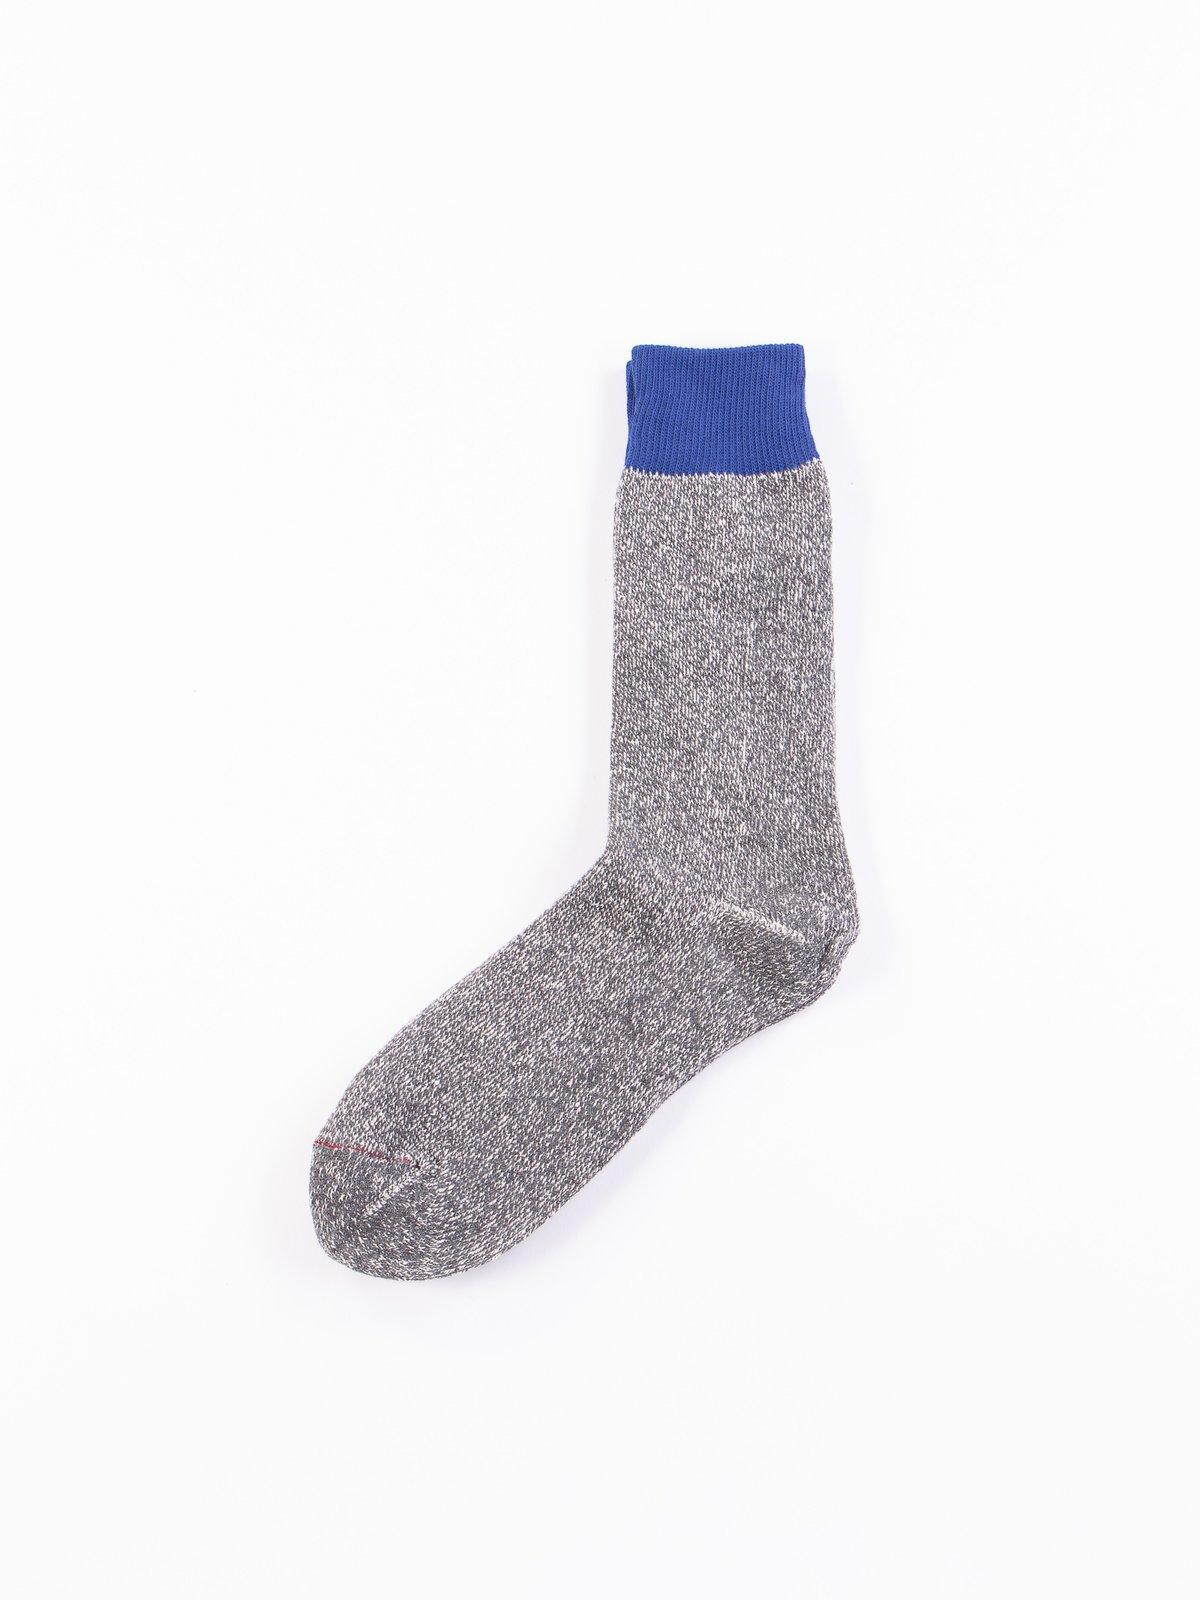 Blue/Grey Double Face Socks - Image 1